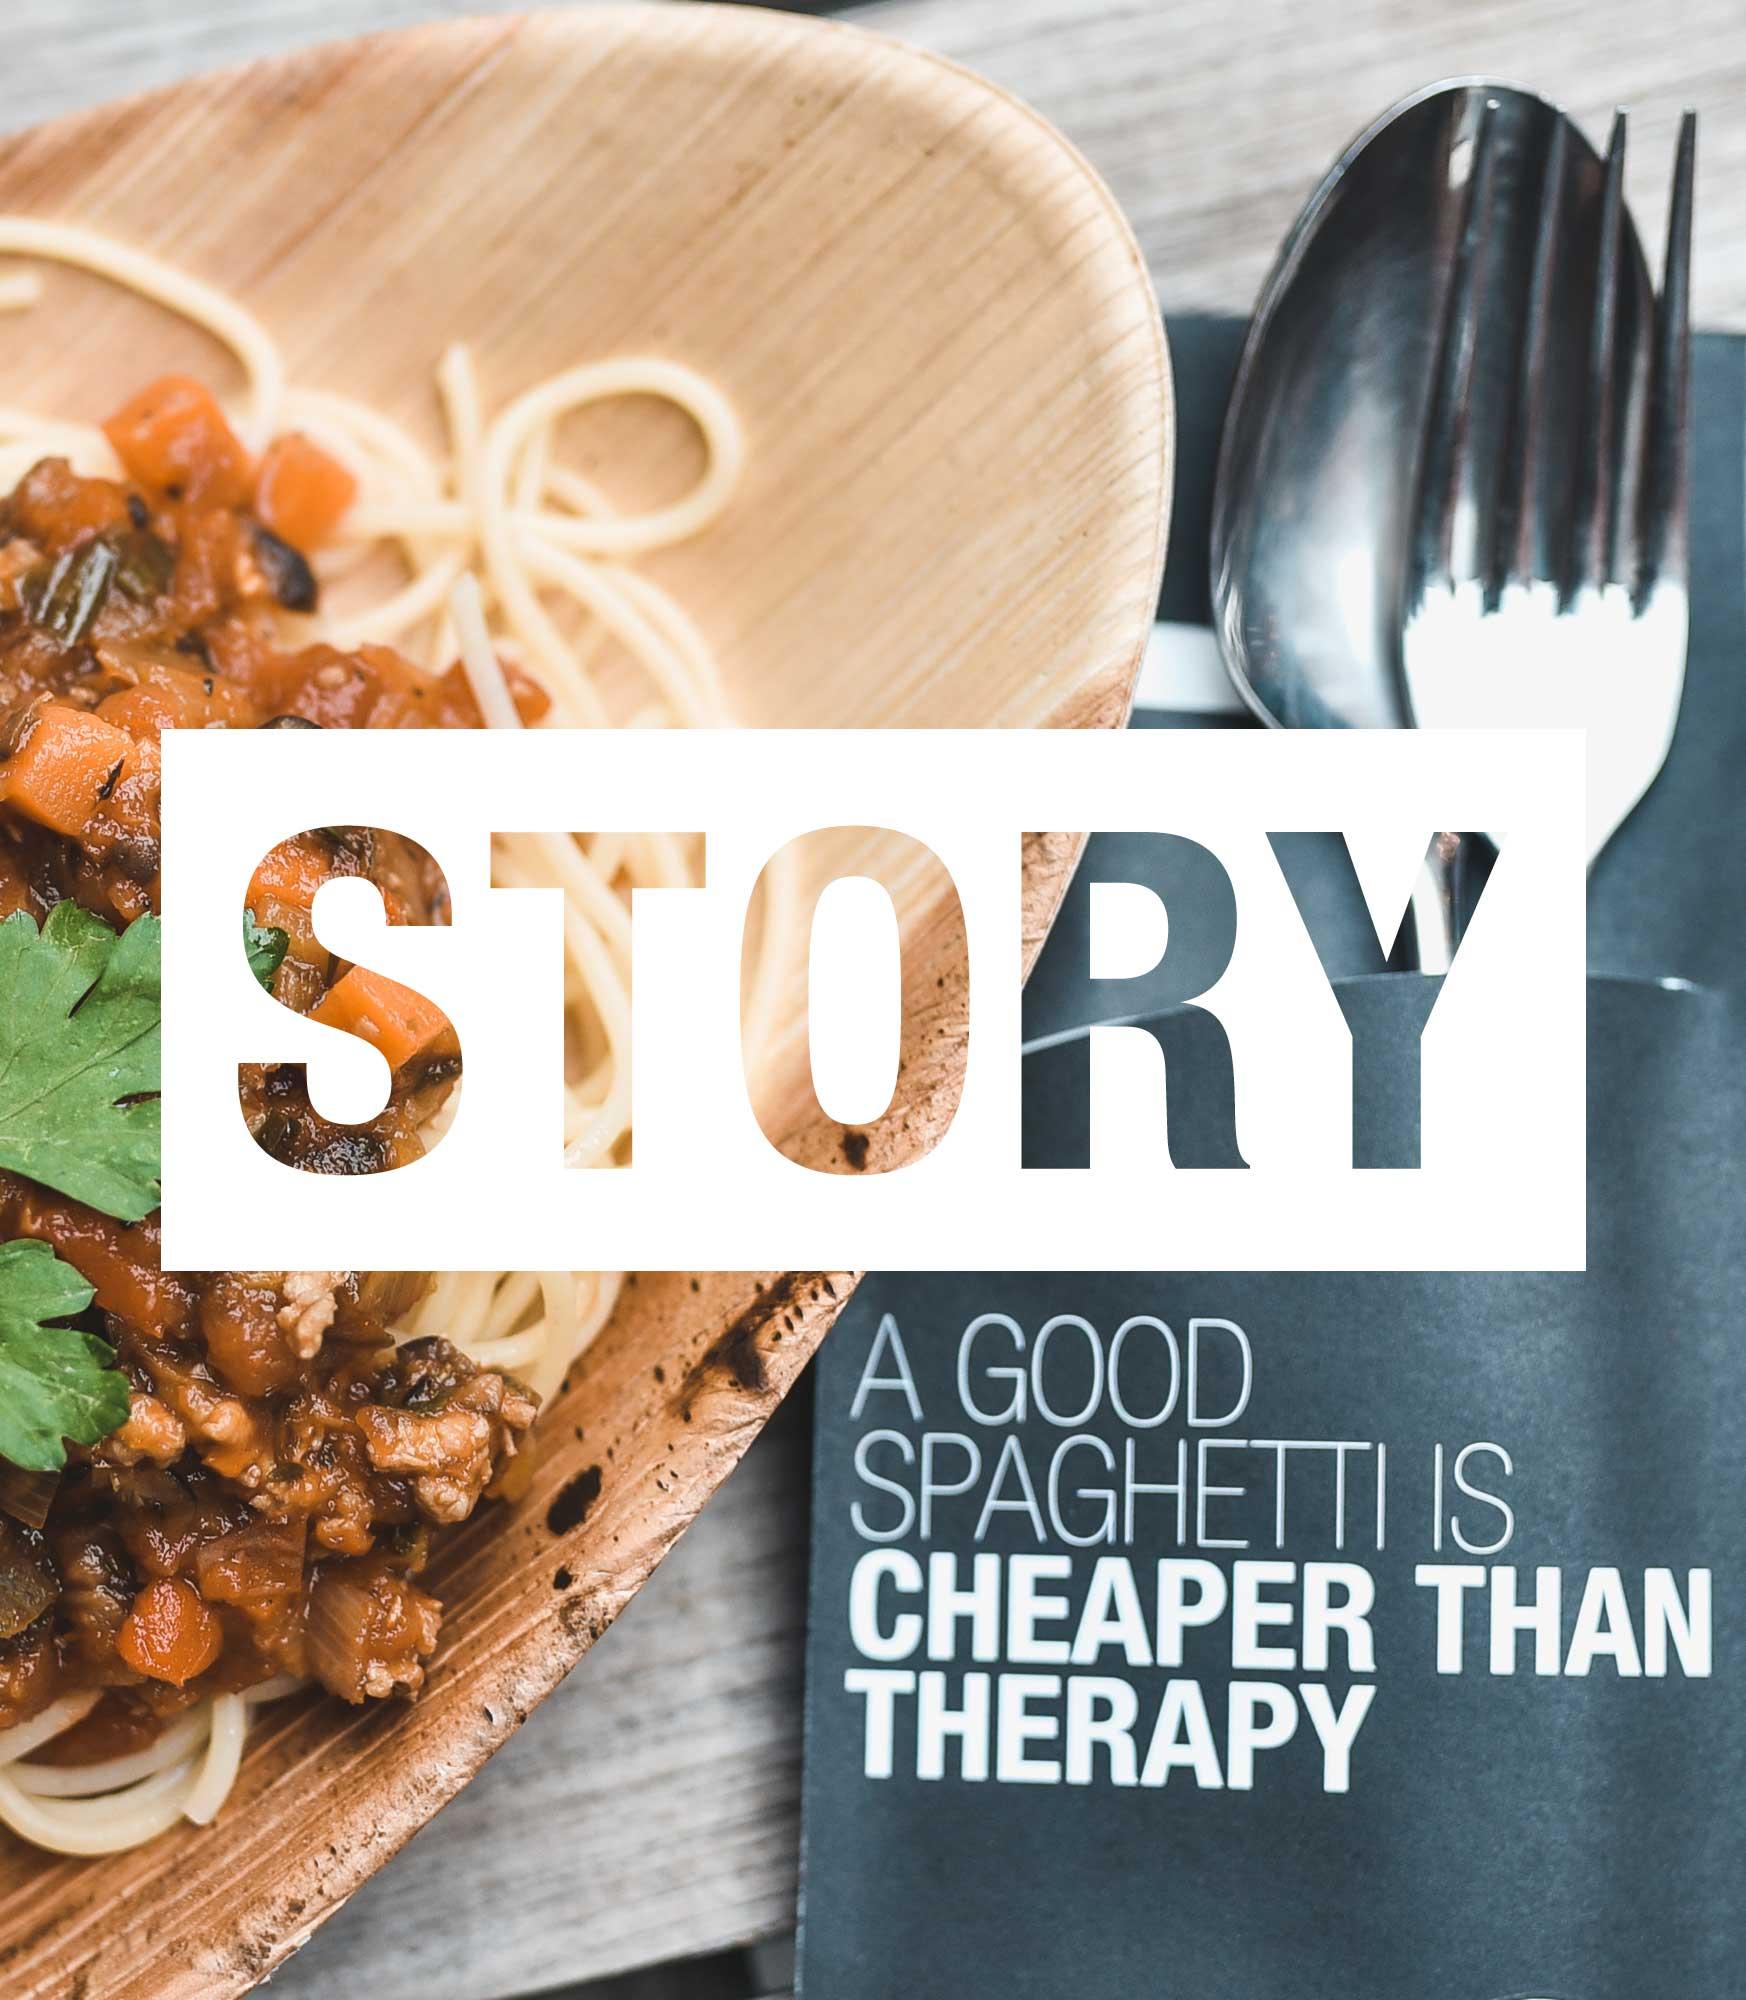 Mister Spaghetti Story